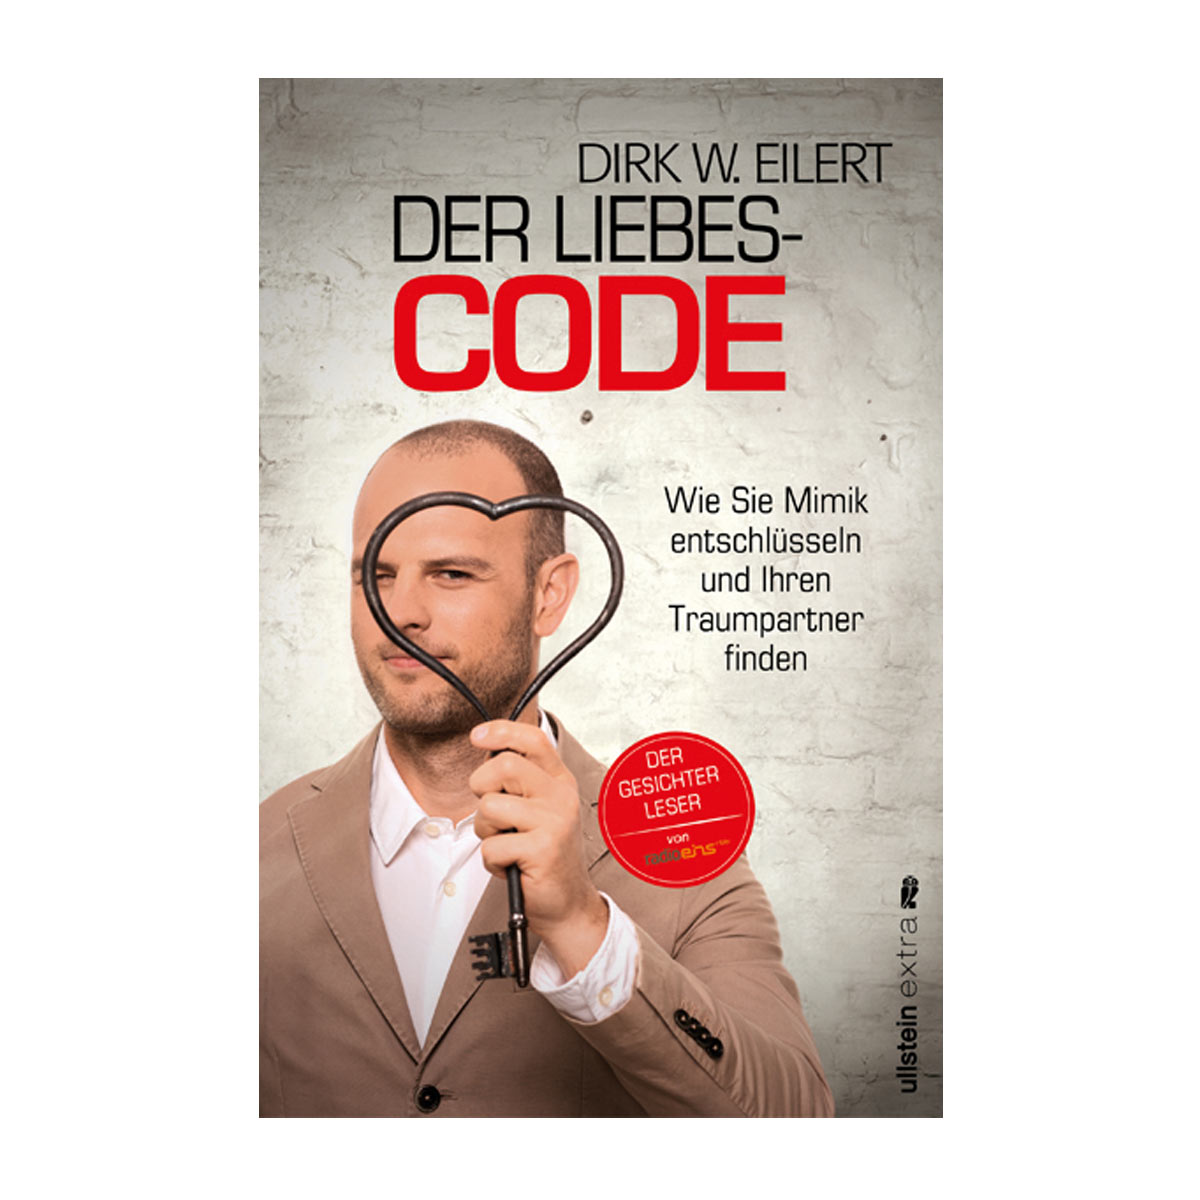 Buch der Liebes-Code